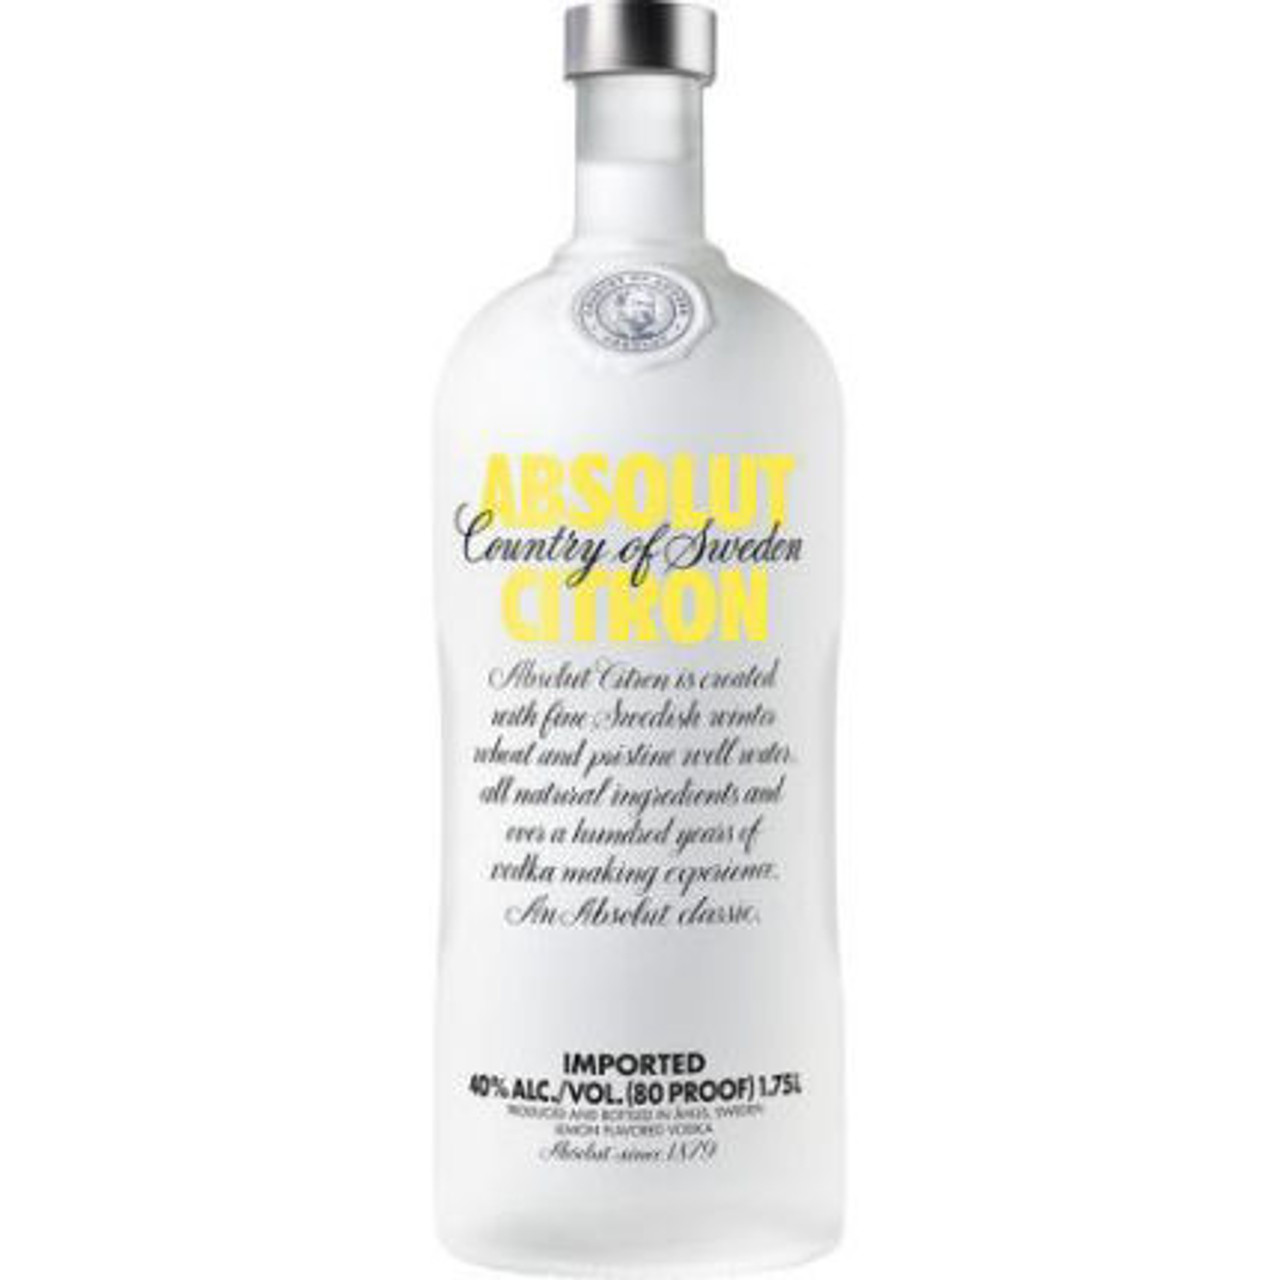 Absolut Citron Swedish Grain Vodka 1.75L